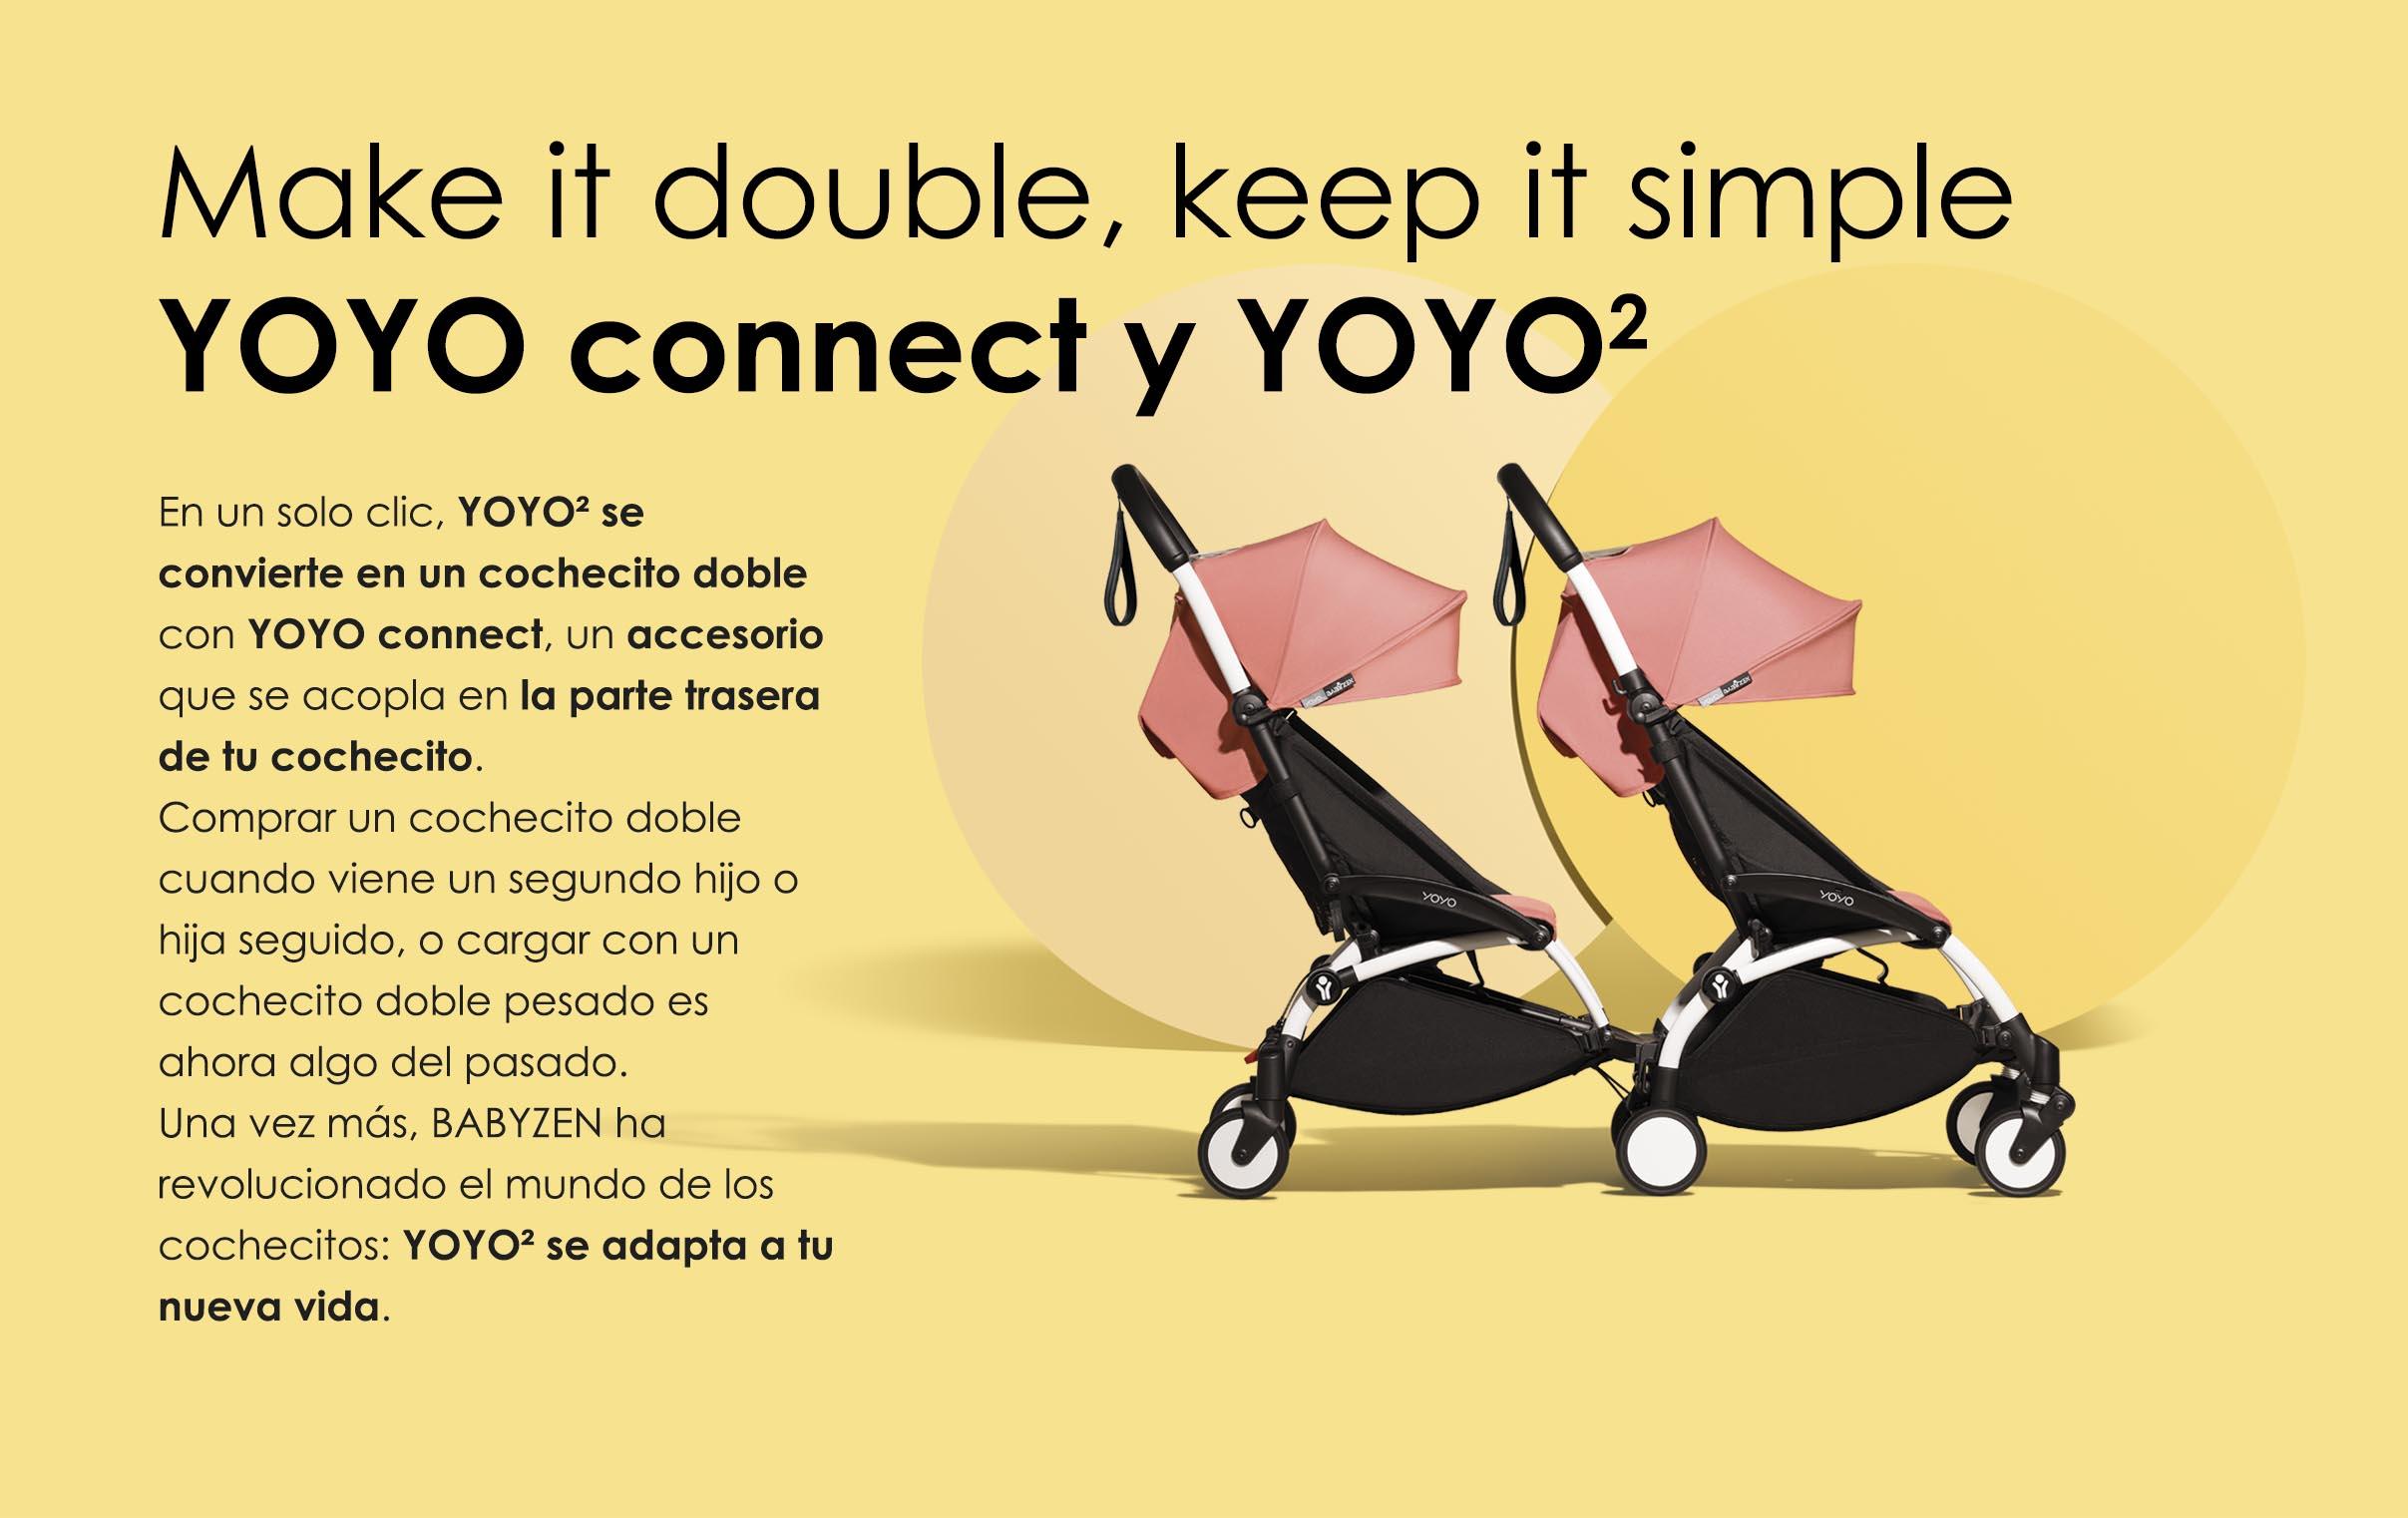 yoyo connect para yoyo 2 de babyzen transforma tu cochecito en un cochecito doble con un solo clic